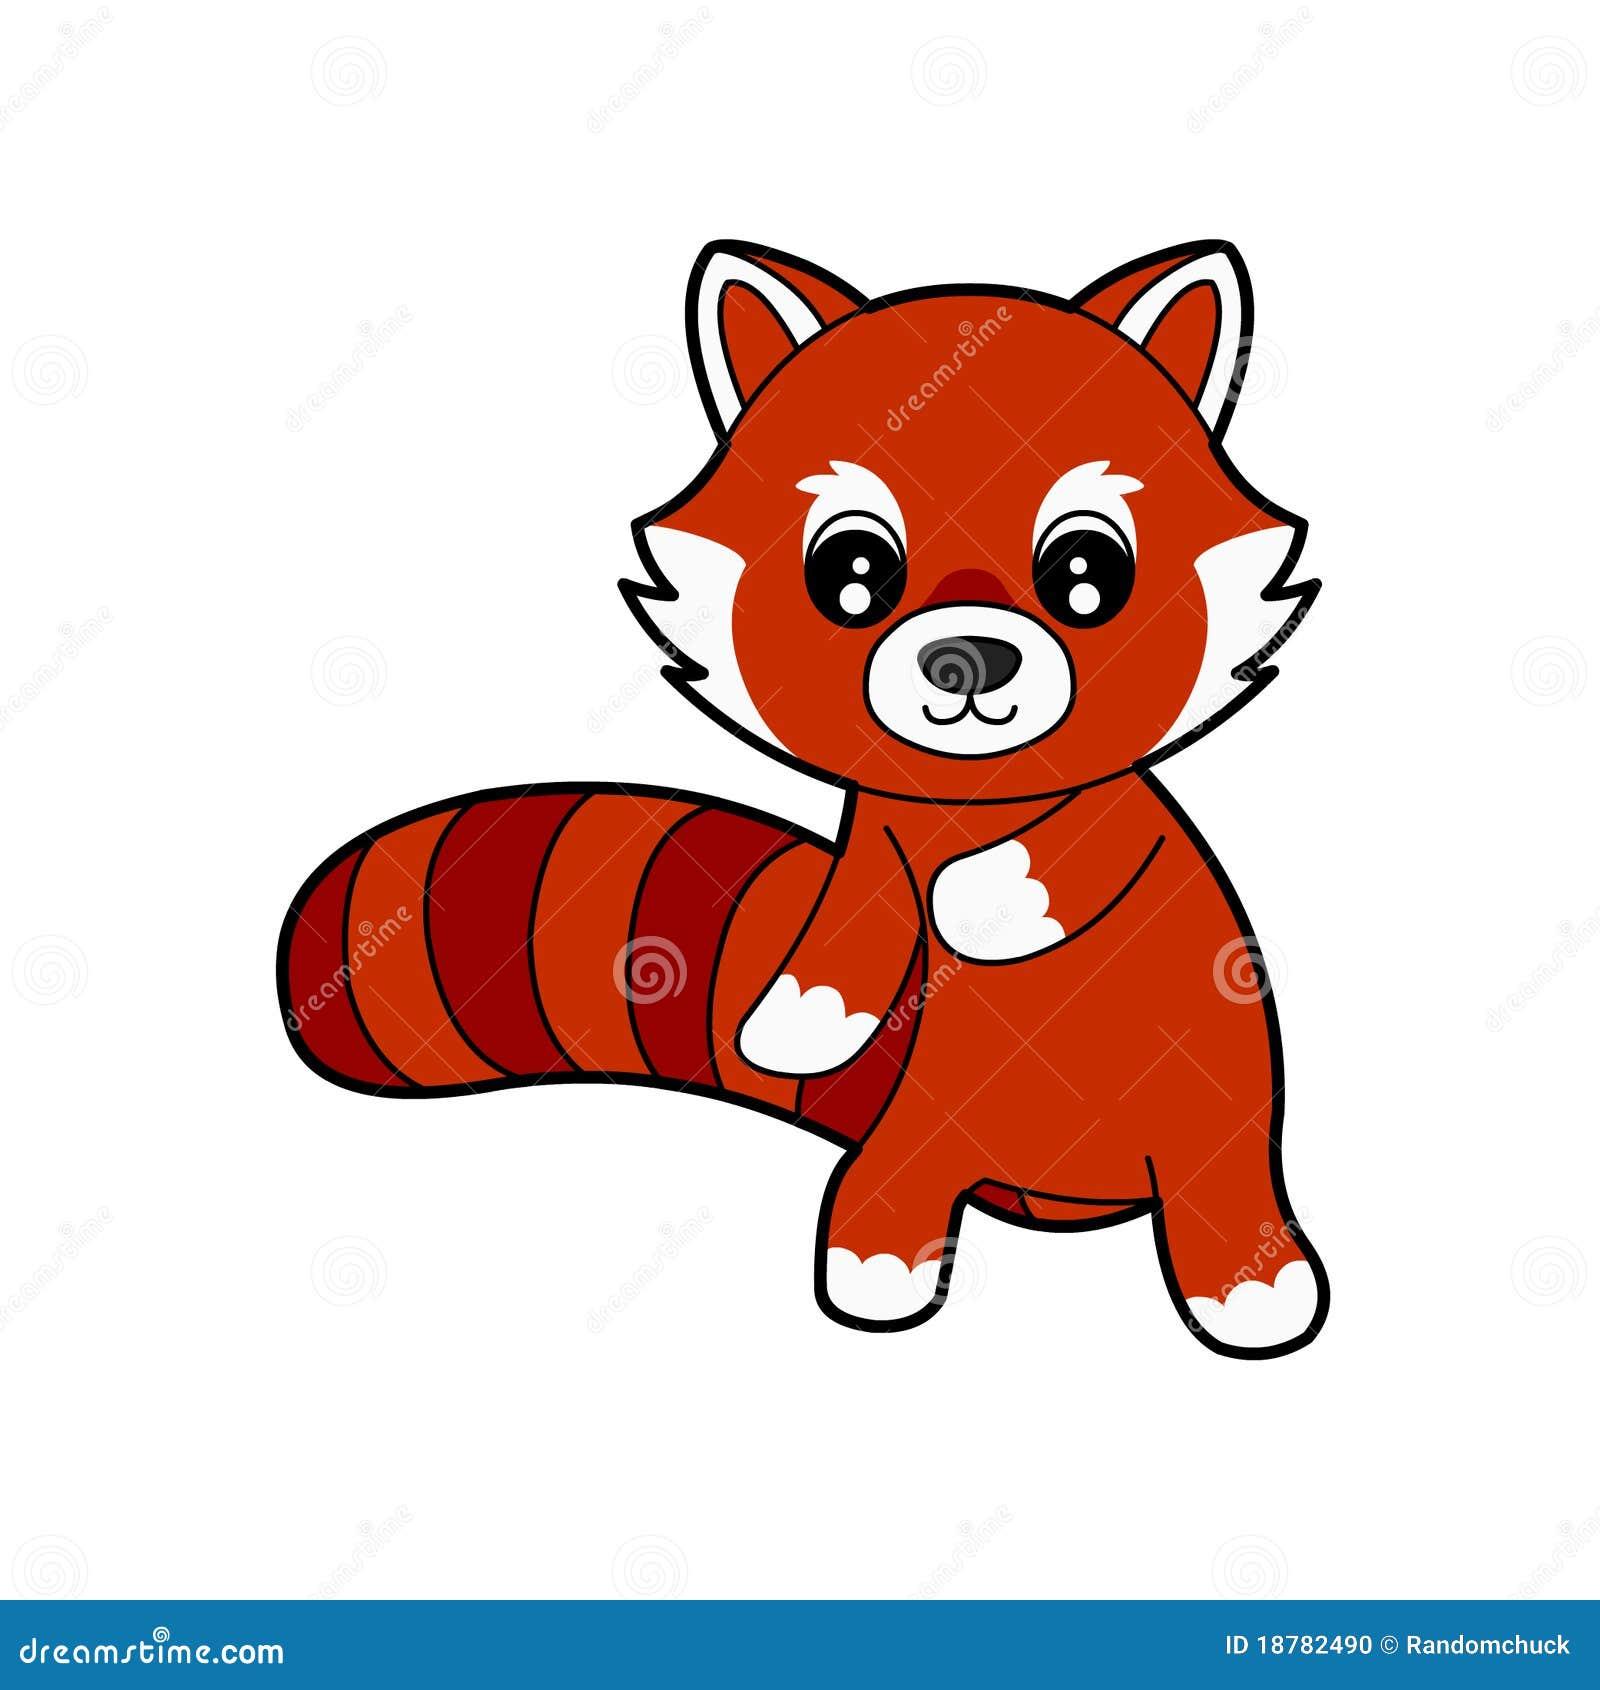 Cute Red Panda Illustration 18782490 Megapixl